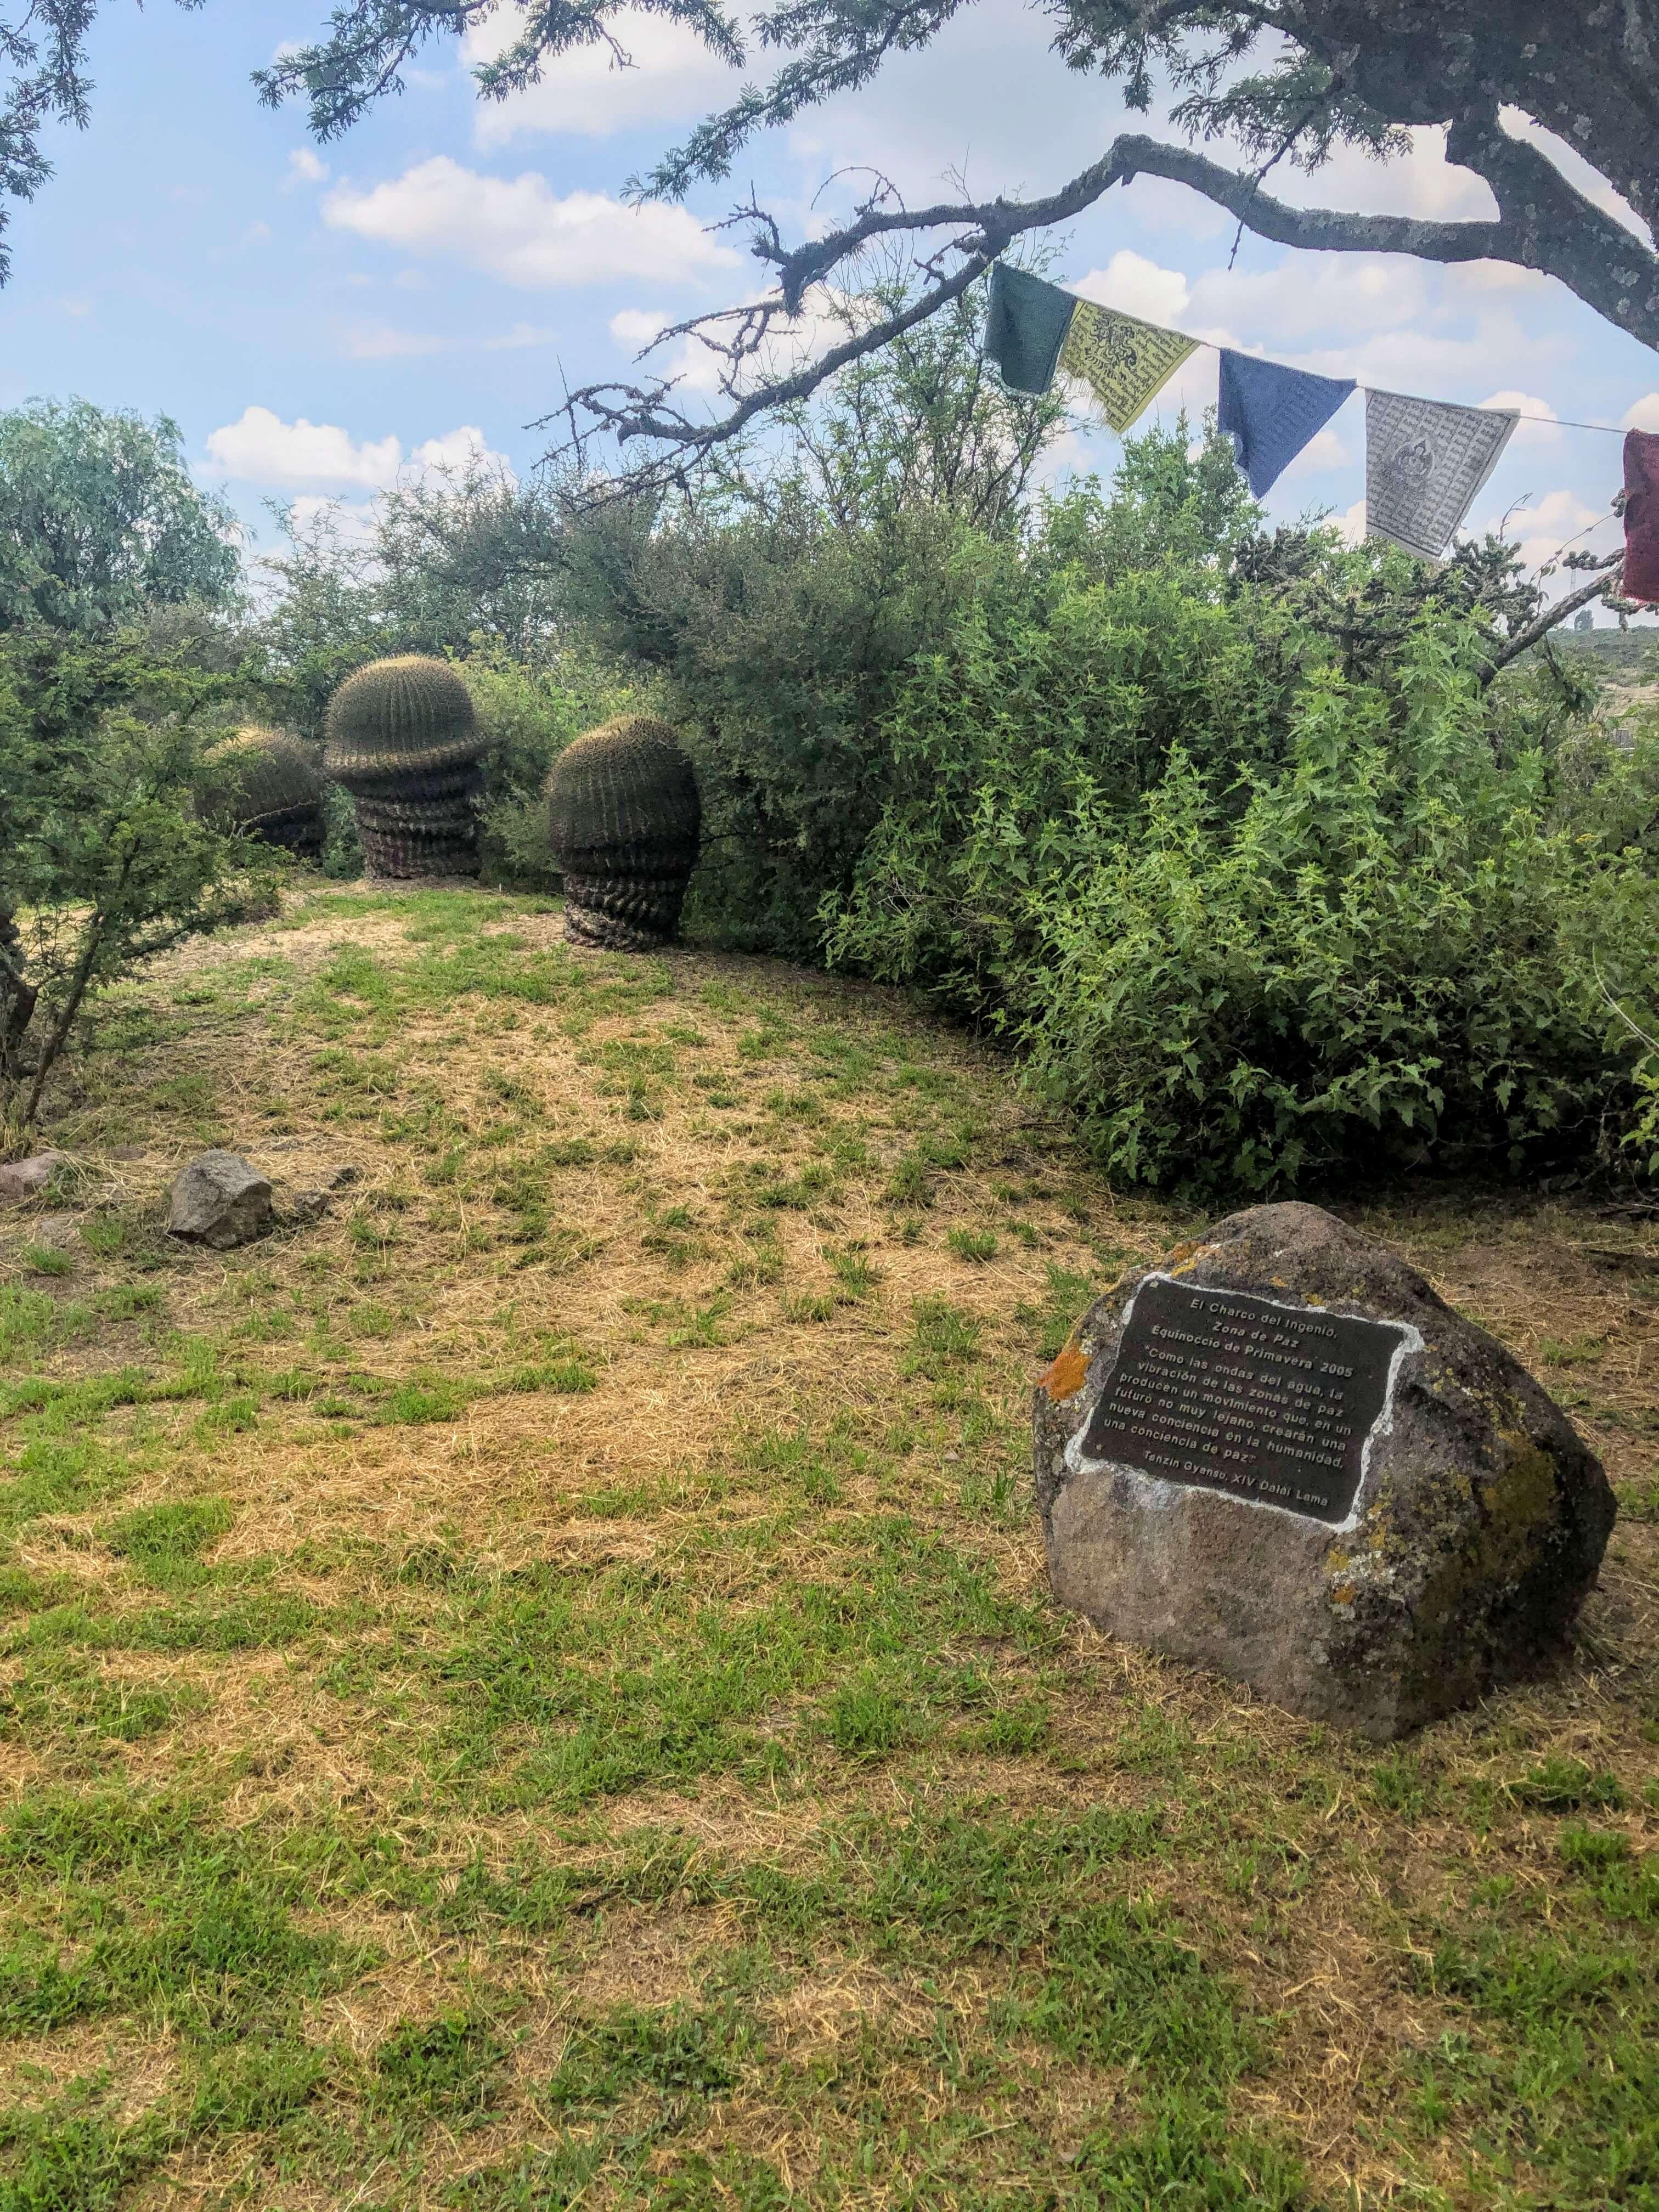 Charco del Ingenio Botanical Garden